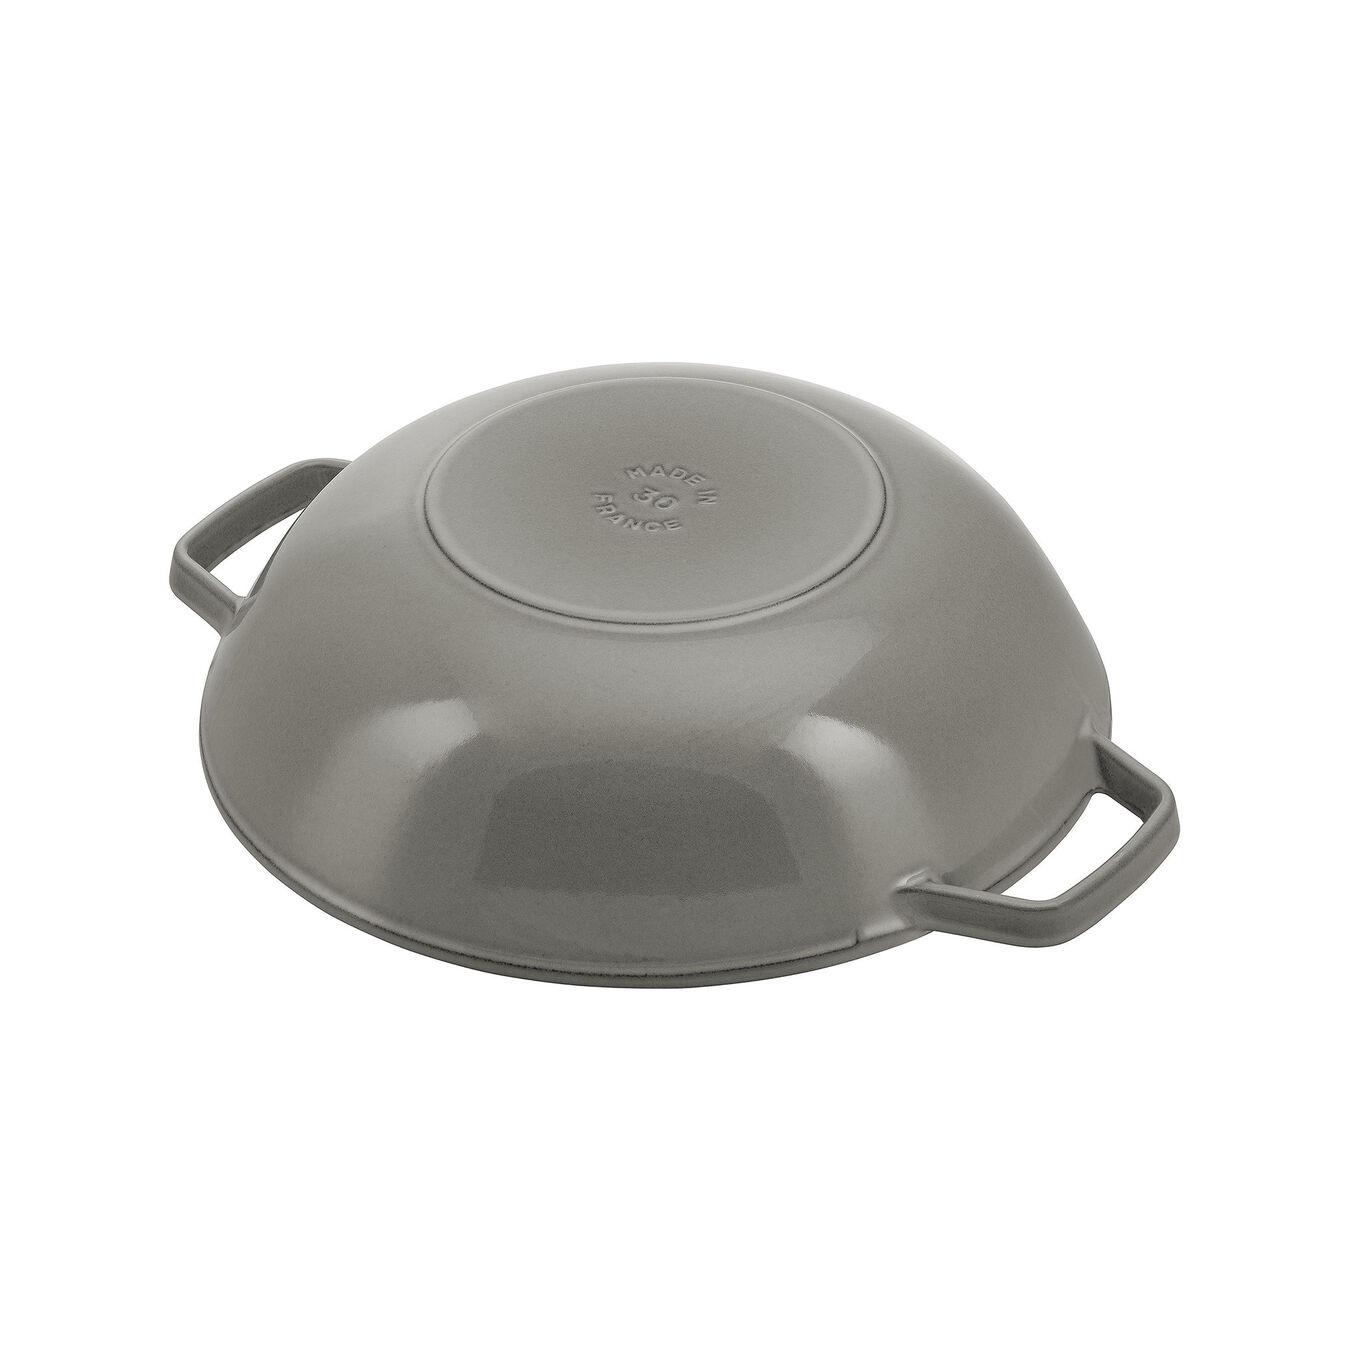 4.5-qt Perfect Pan - Graphite Grey,,large 2